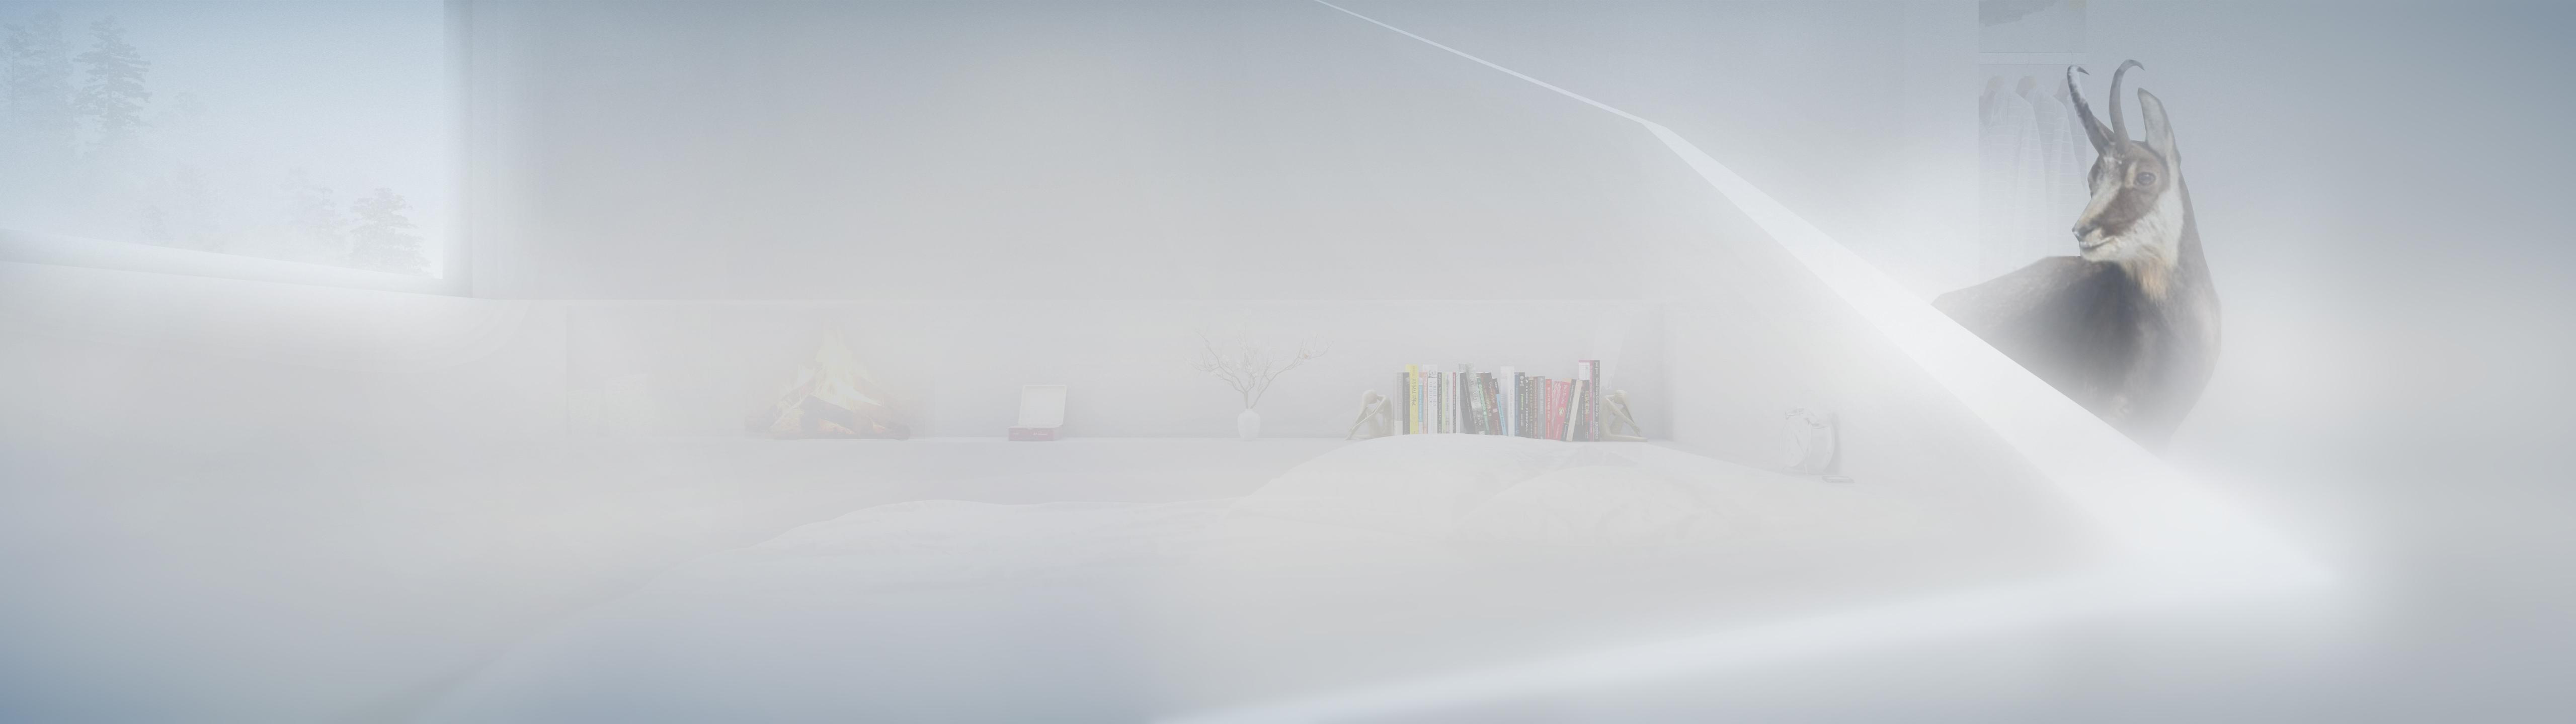 ice_bed_rendering_012